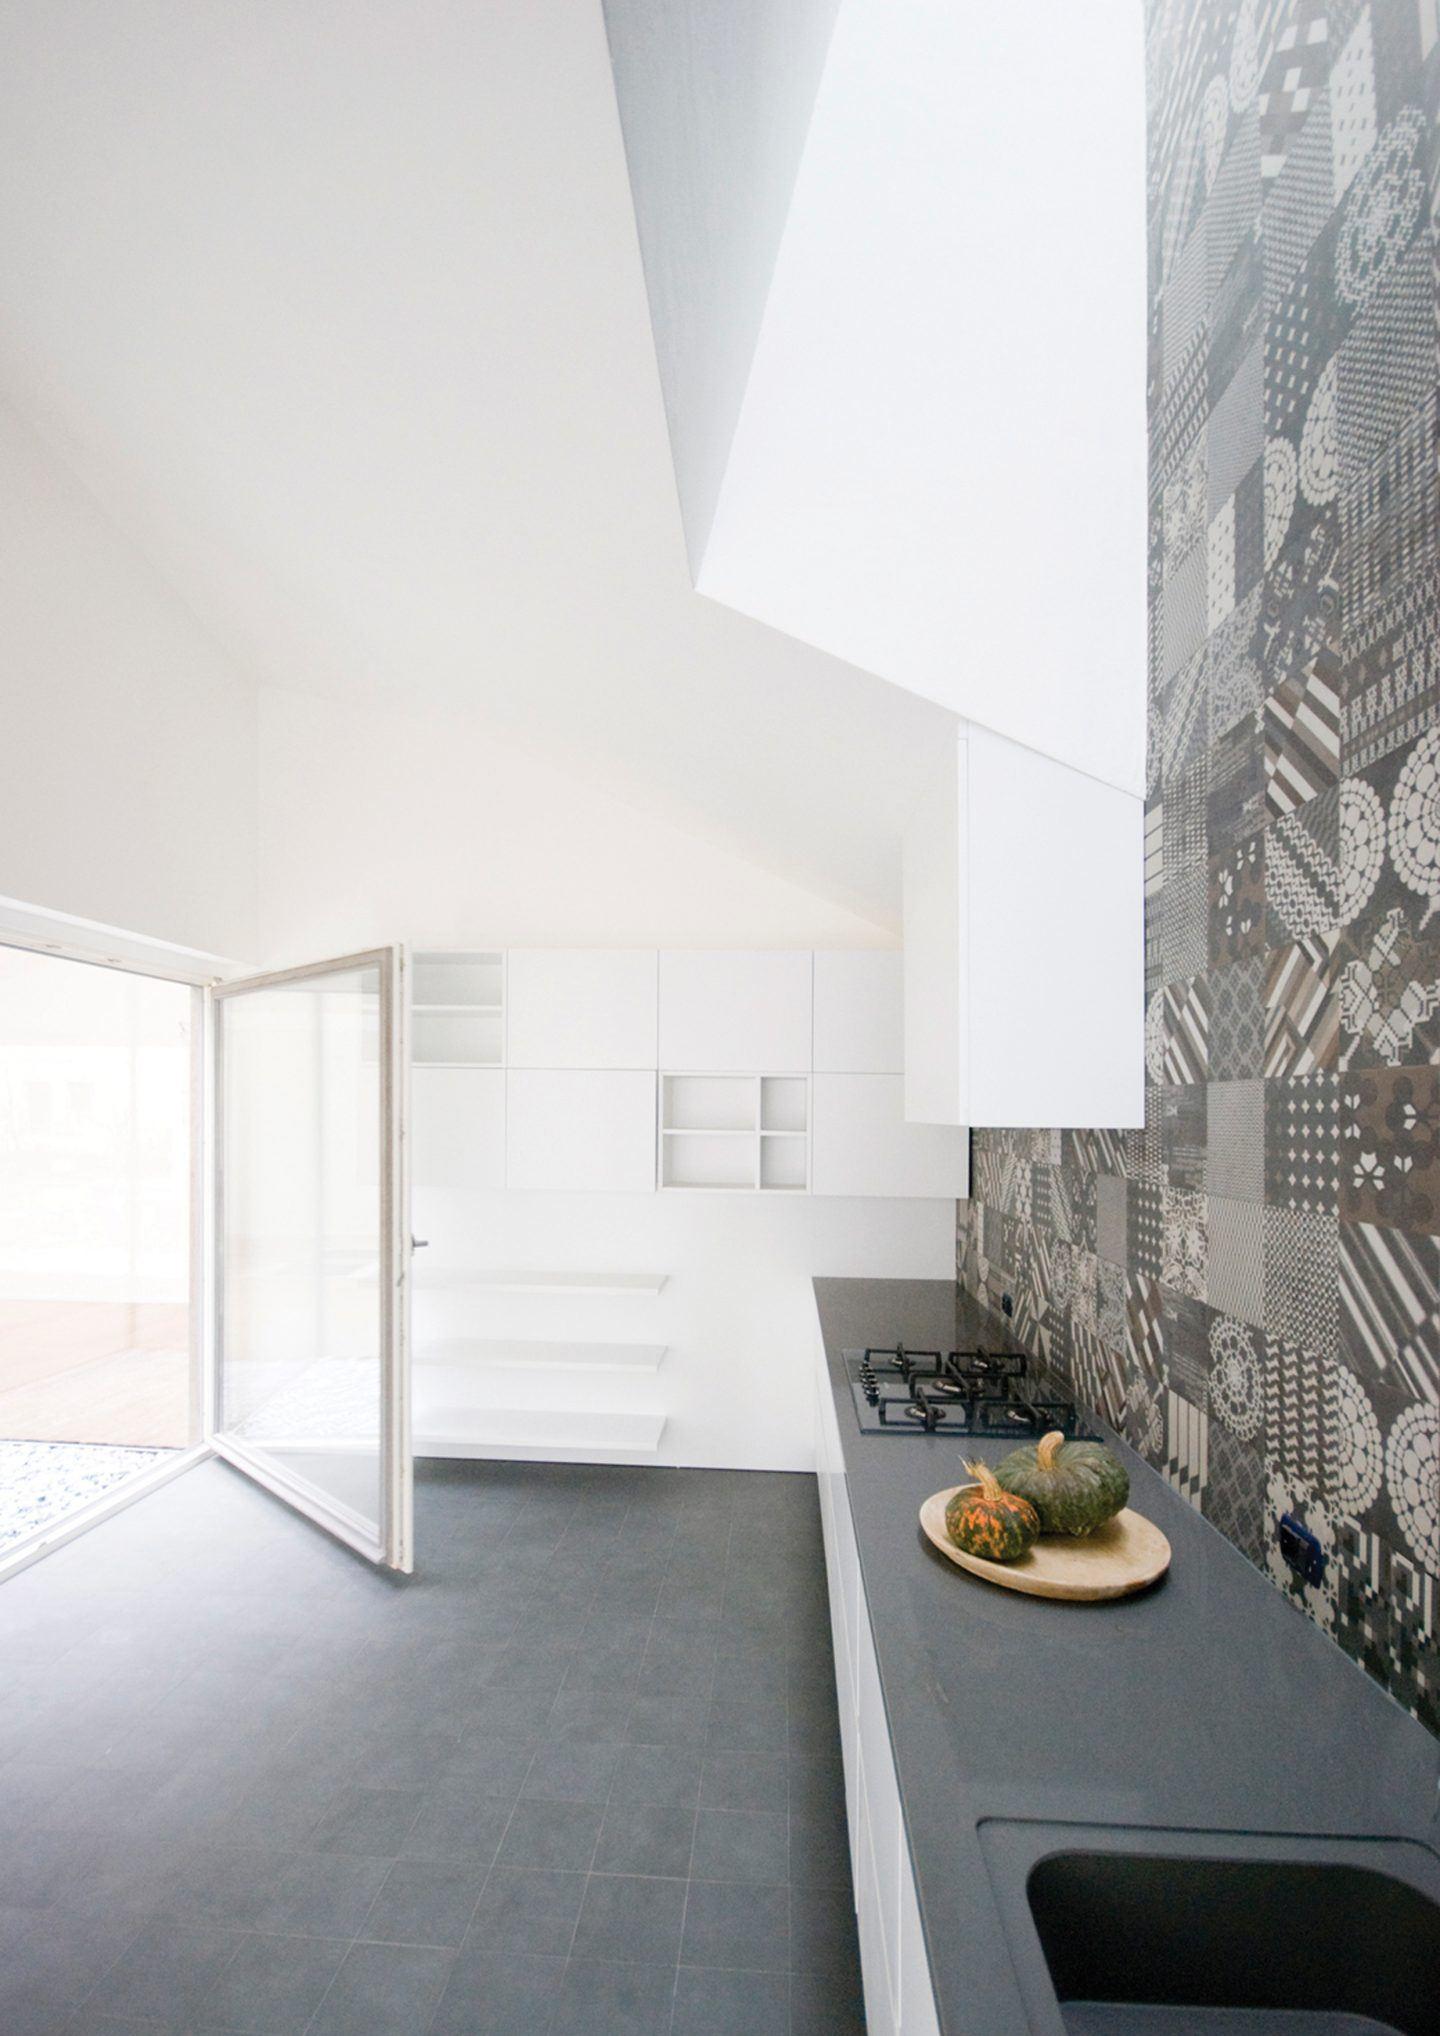 IGNANT-Architecture-ifdesign-Wigglyhouse-7